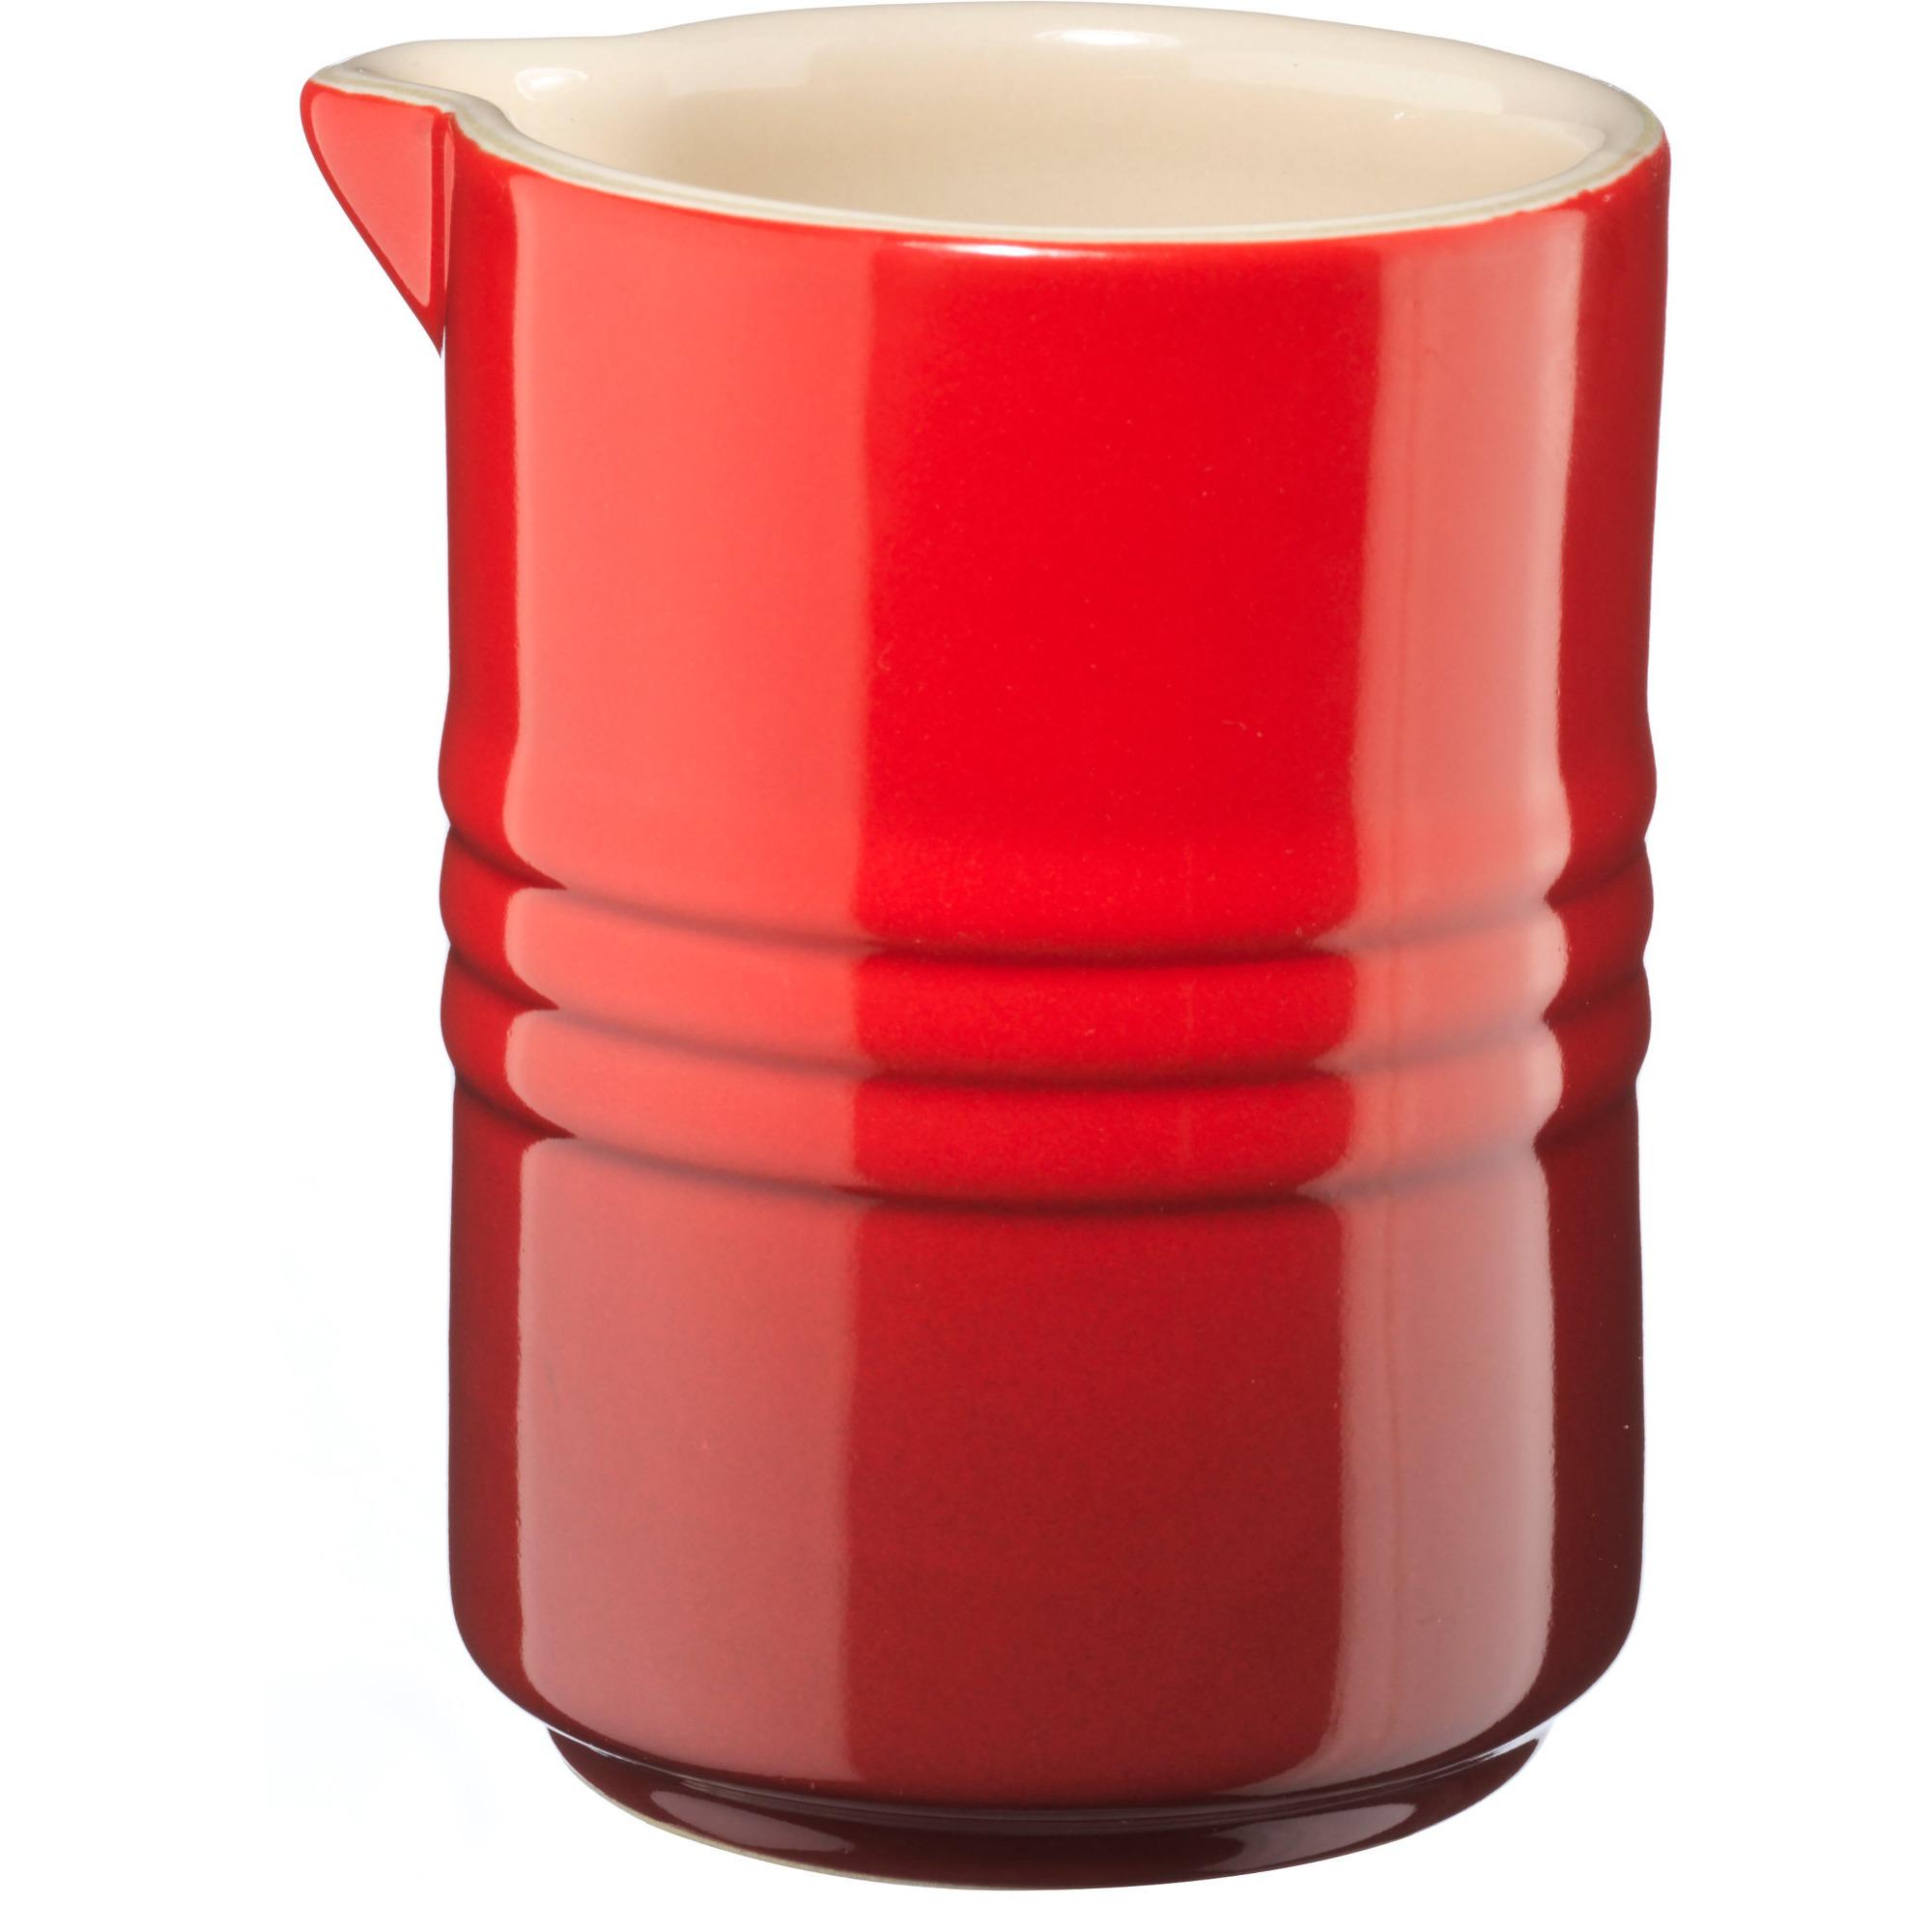 Le Creuset Liten Kanna 015 L Röd